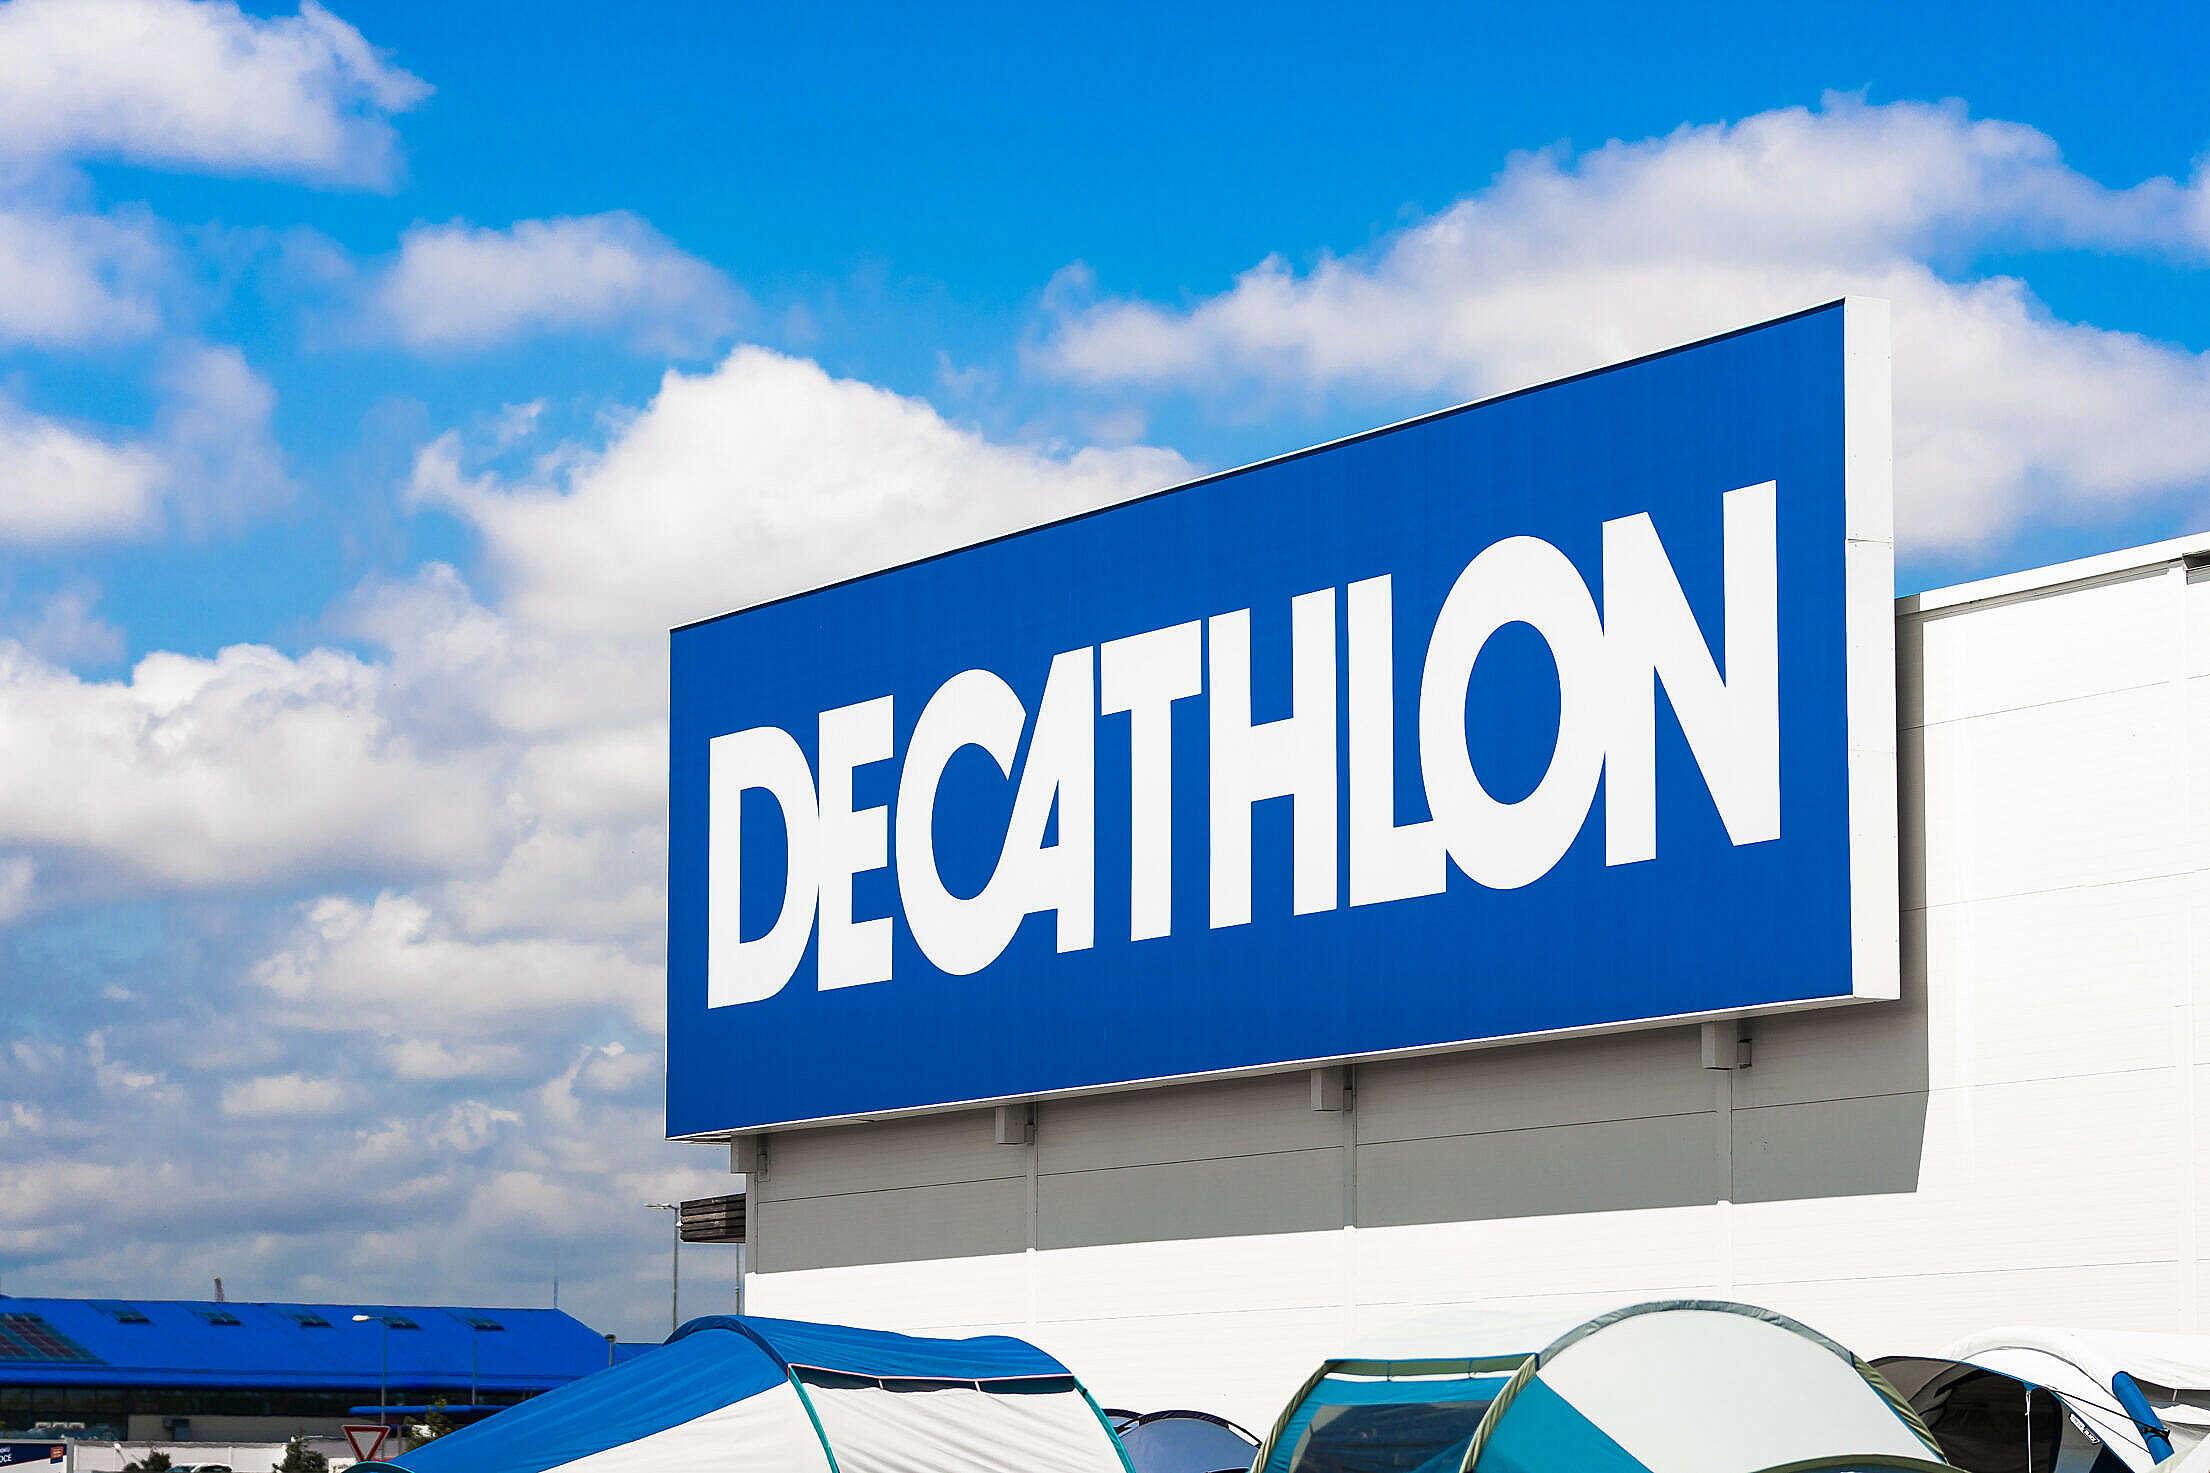 Decathlon Store Logo Free Stock Photo